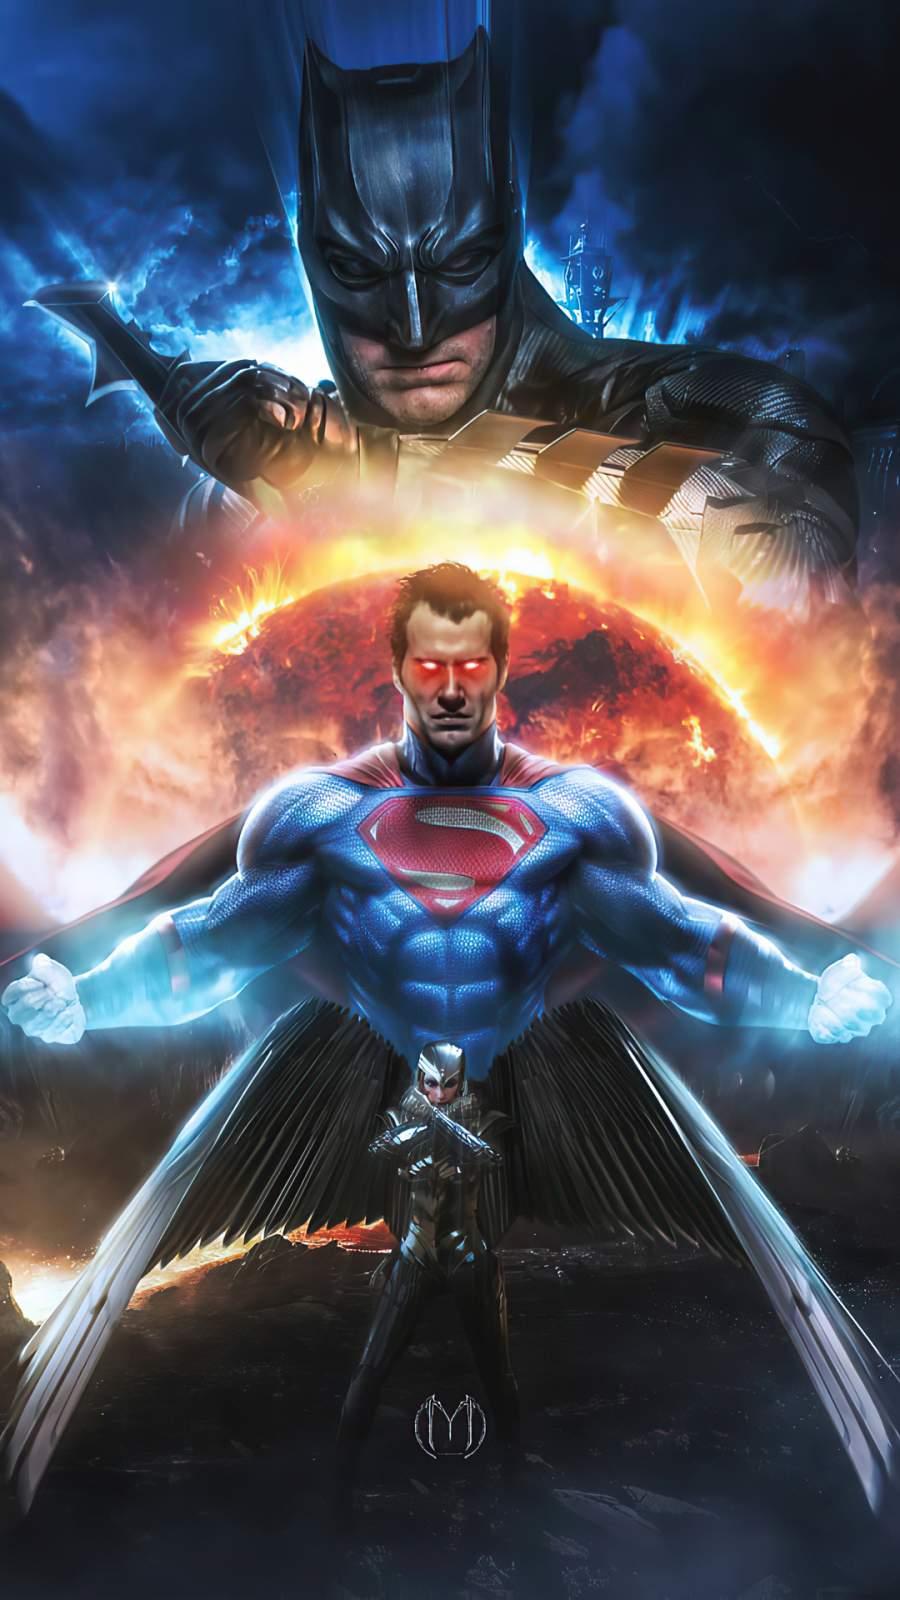 Superman vs DC Superheroes